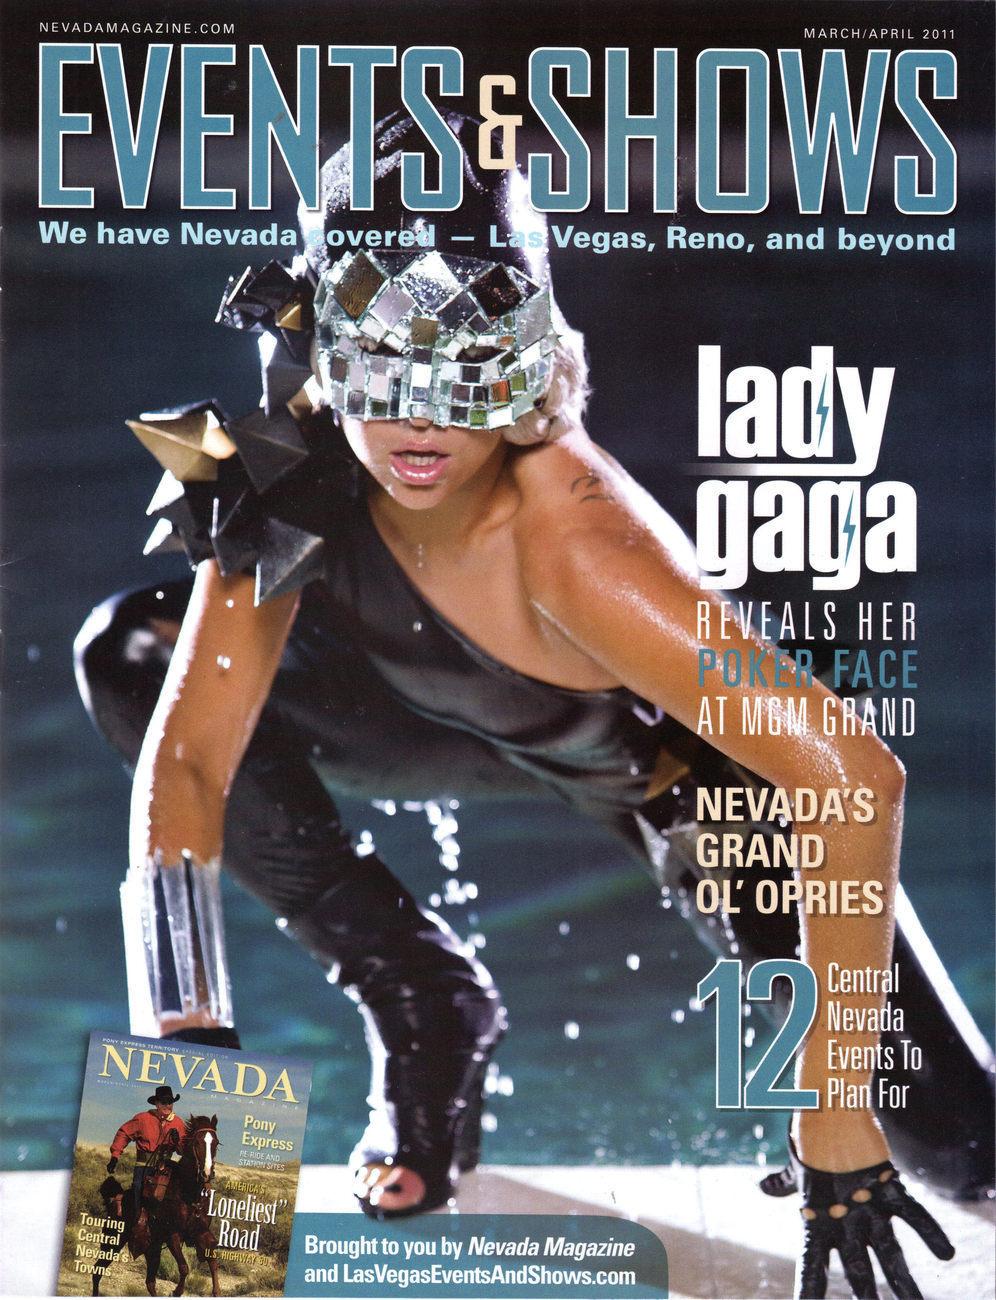 Events shows lady gaga